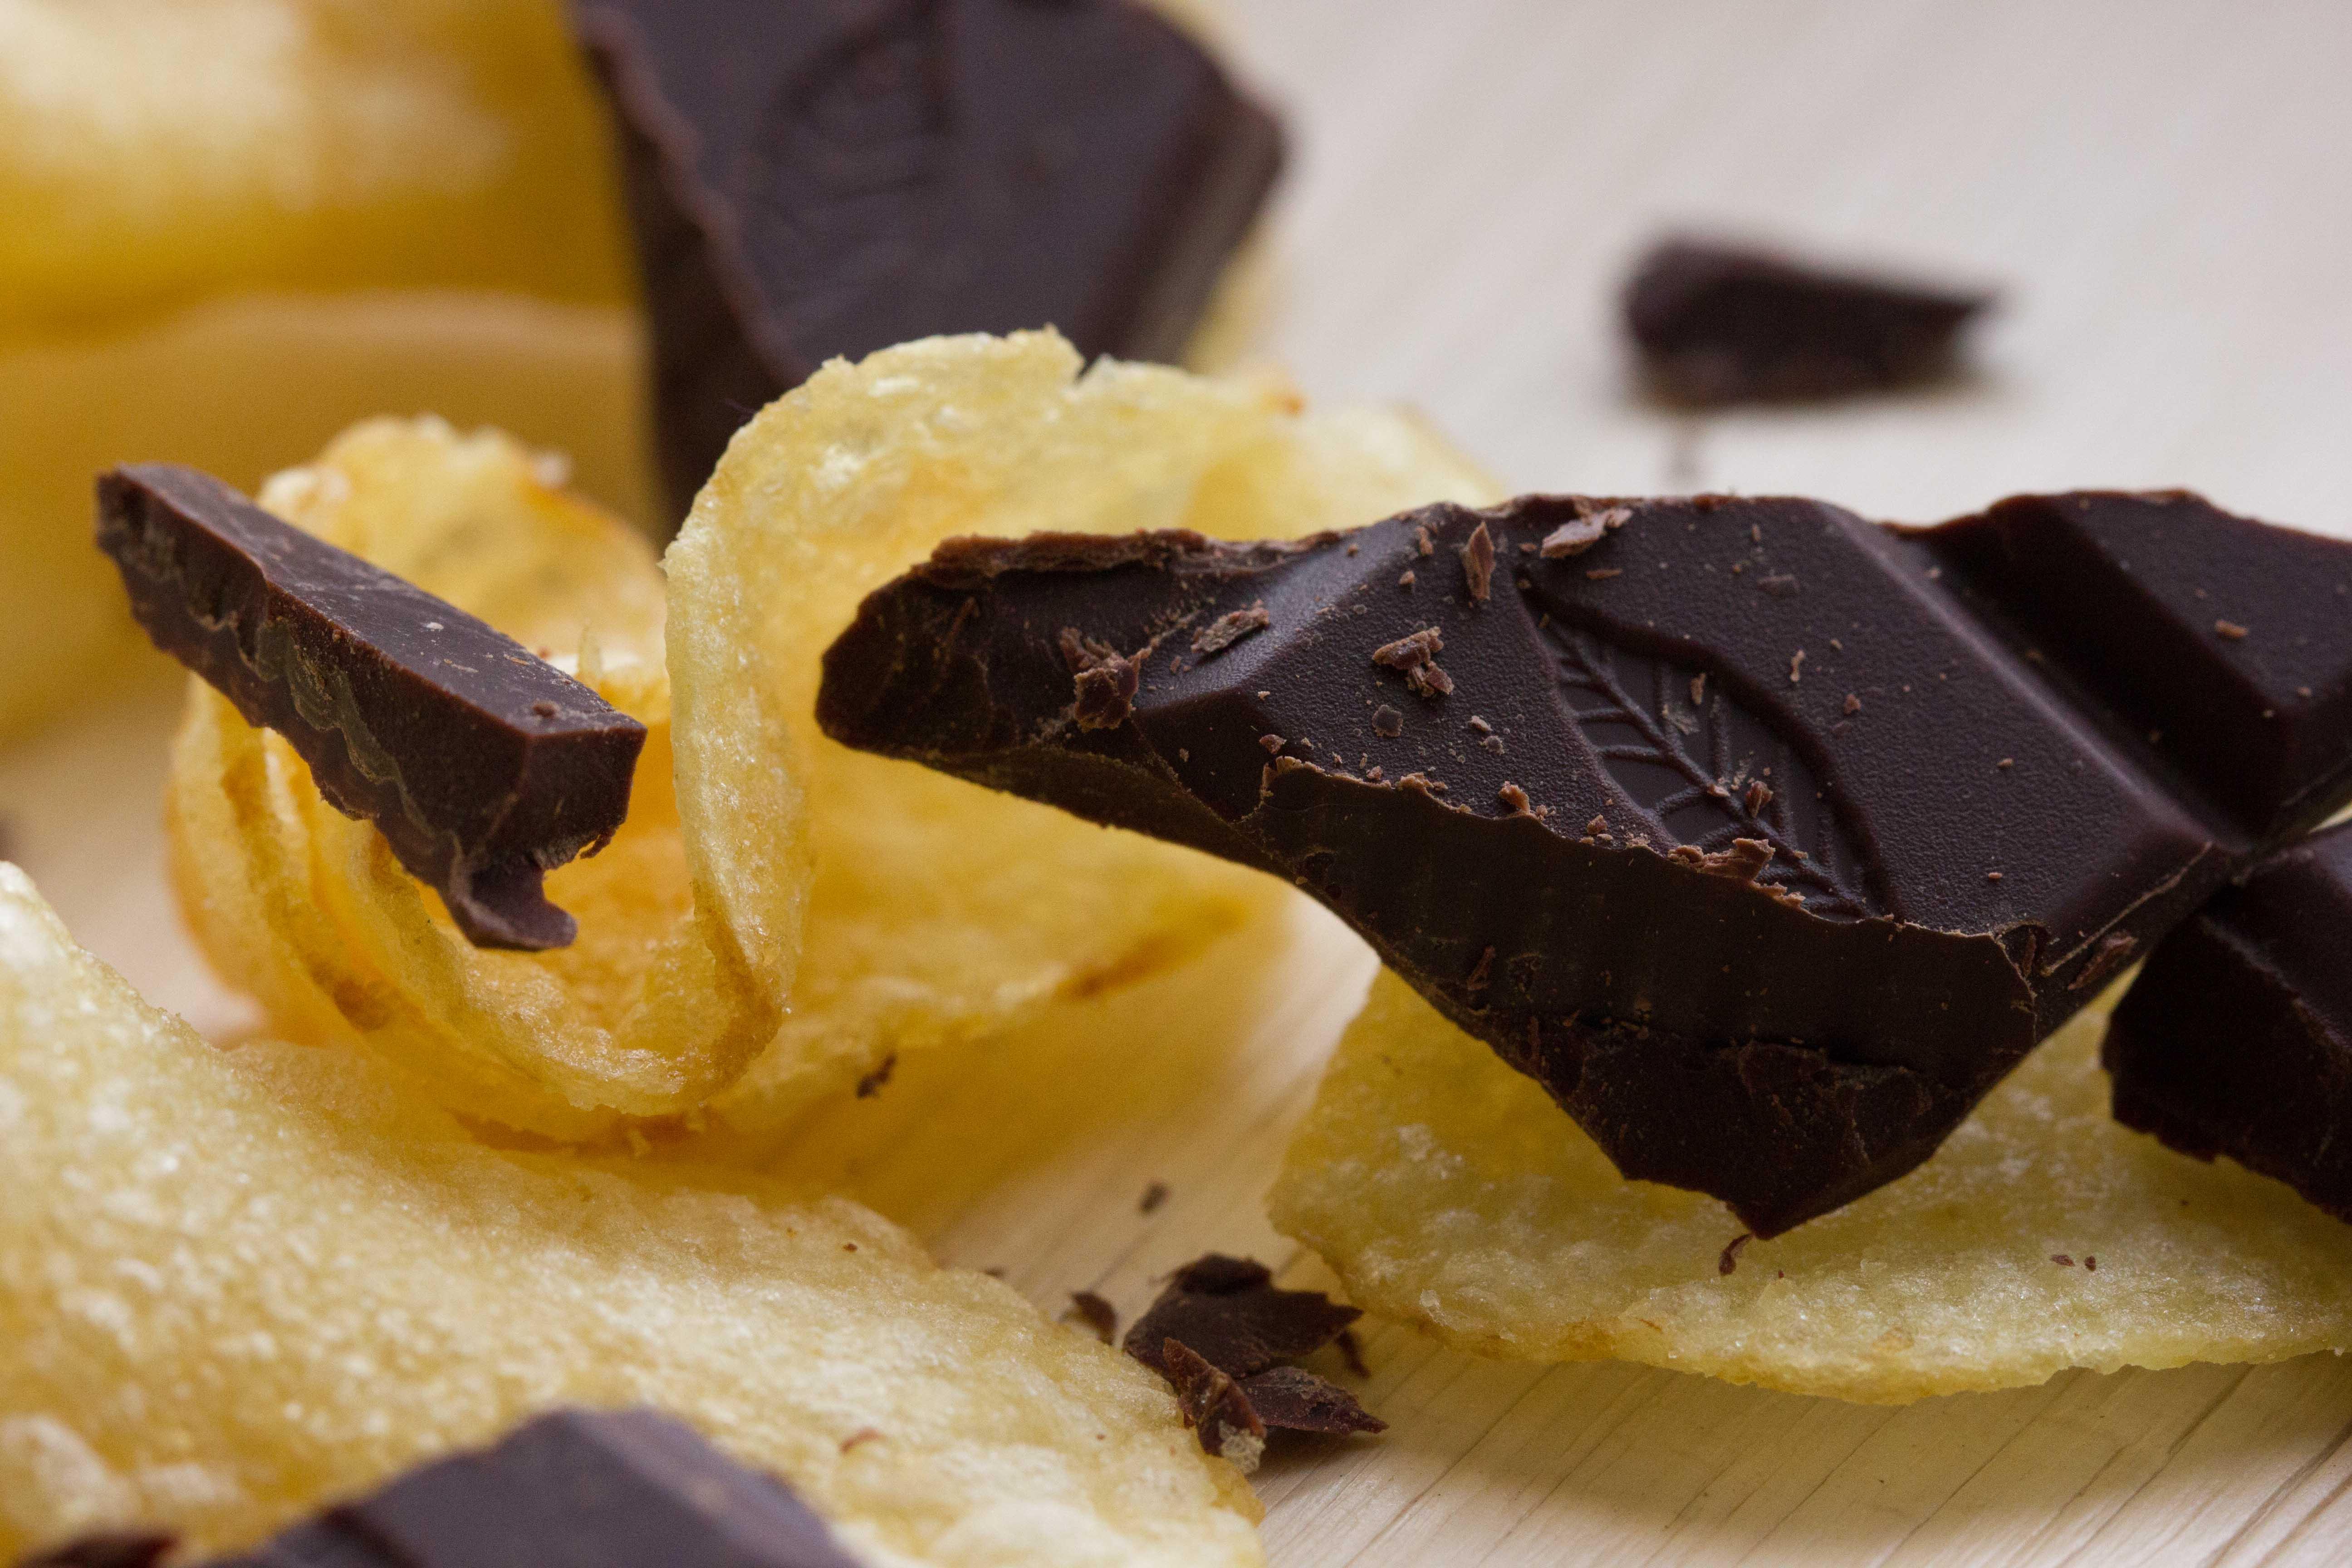 Kallari Chocolate For Your Snacking Pleasure